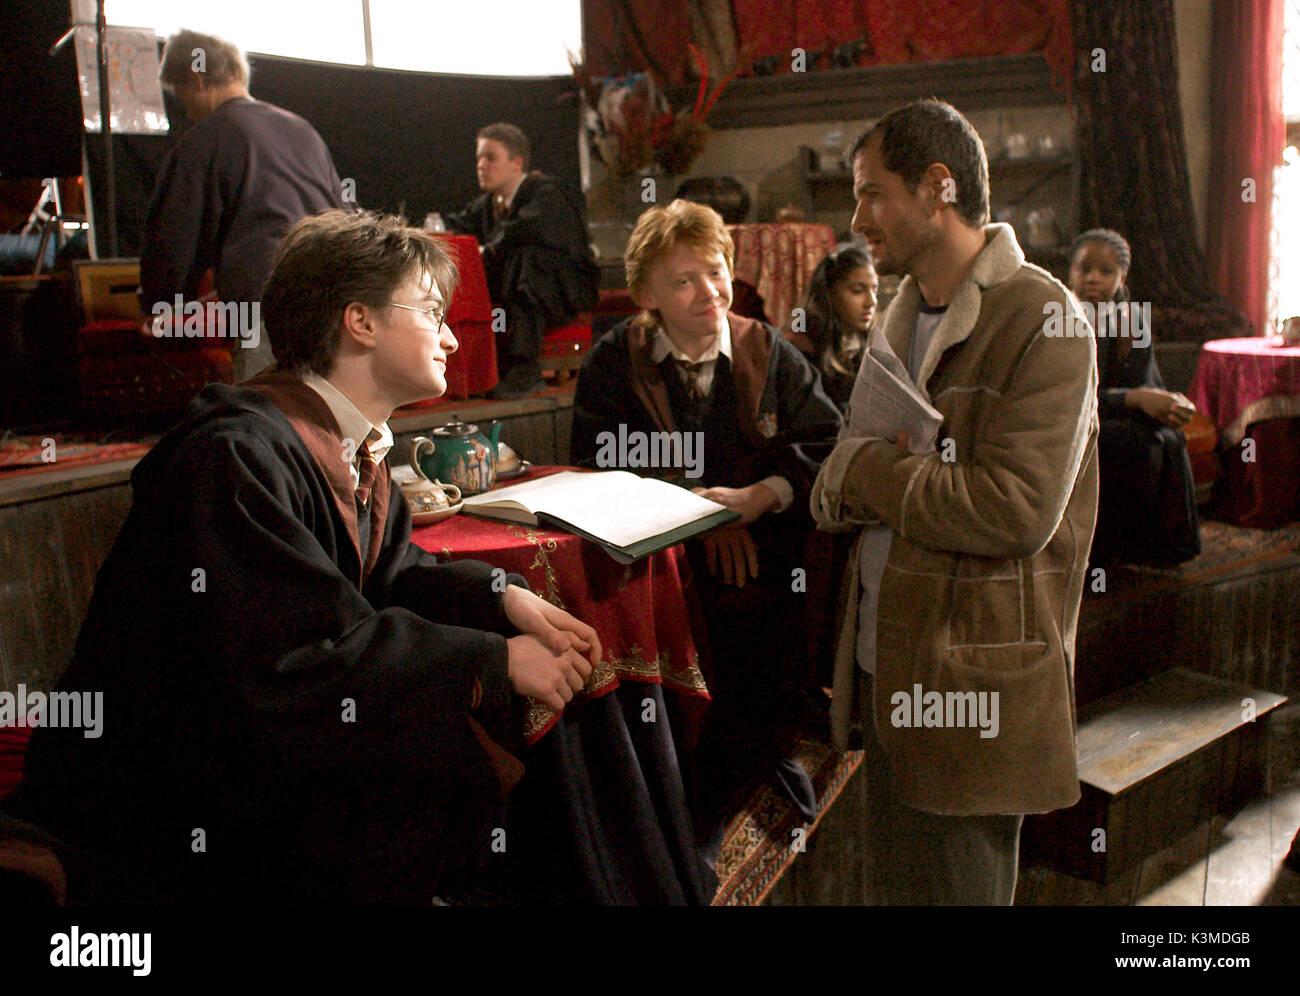 HARRY POTTER AND THE PRISONER OF AZKABAN [BR / US 2004] [L-R] DANIEL RADCLIFFE as Harry Potter, RUPERT GRINT as Ron Weasley, Producer DAVID HEYMAN     Date: 2004 - Stock Image